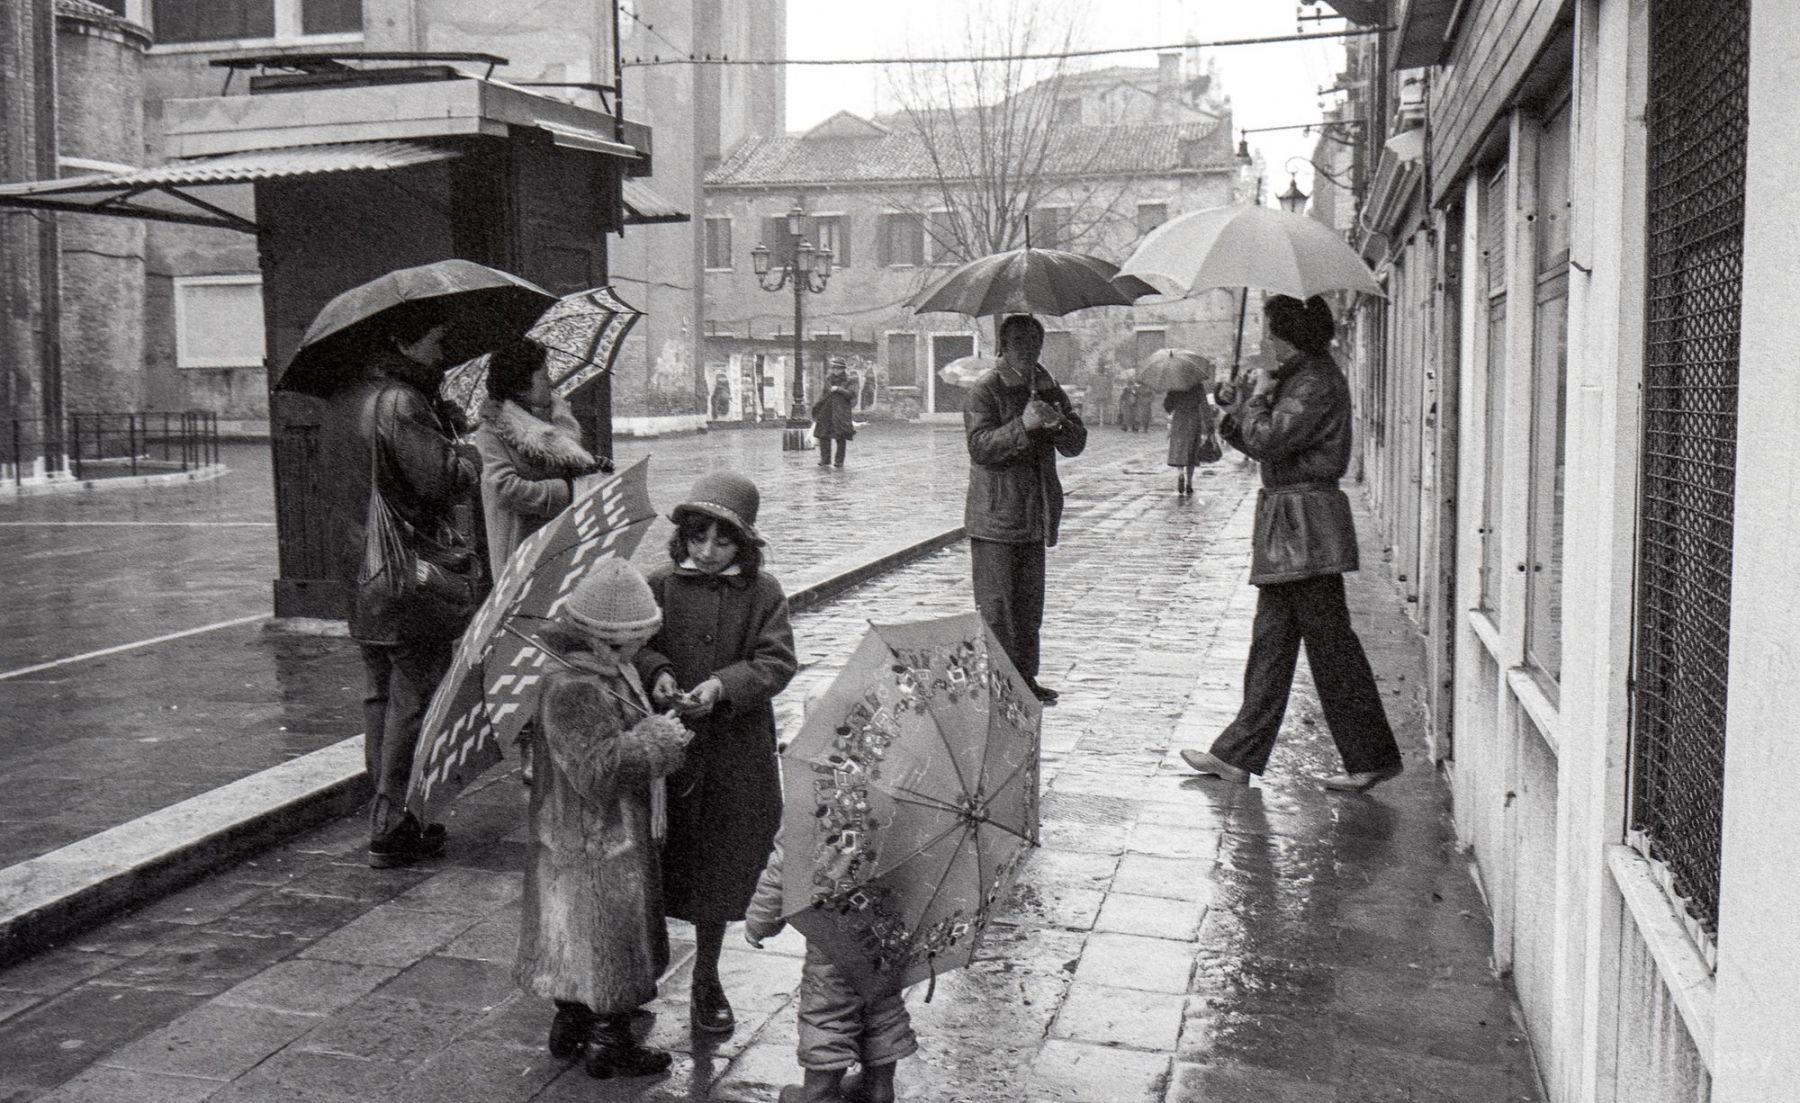 MichelAycaguer-Venise-AquaAlta-Noel-1981-25